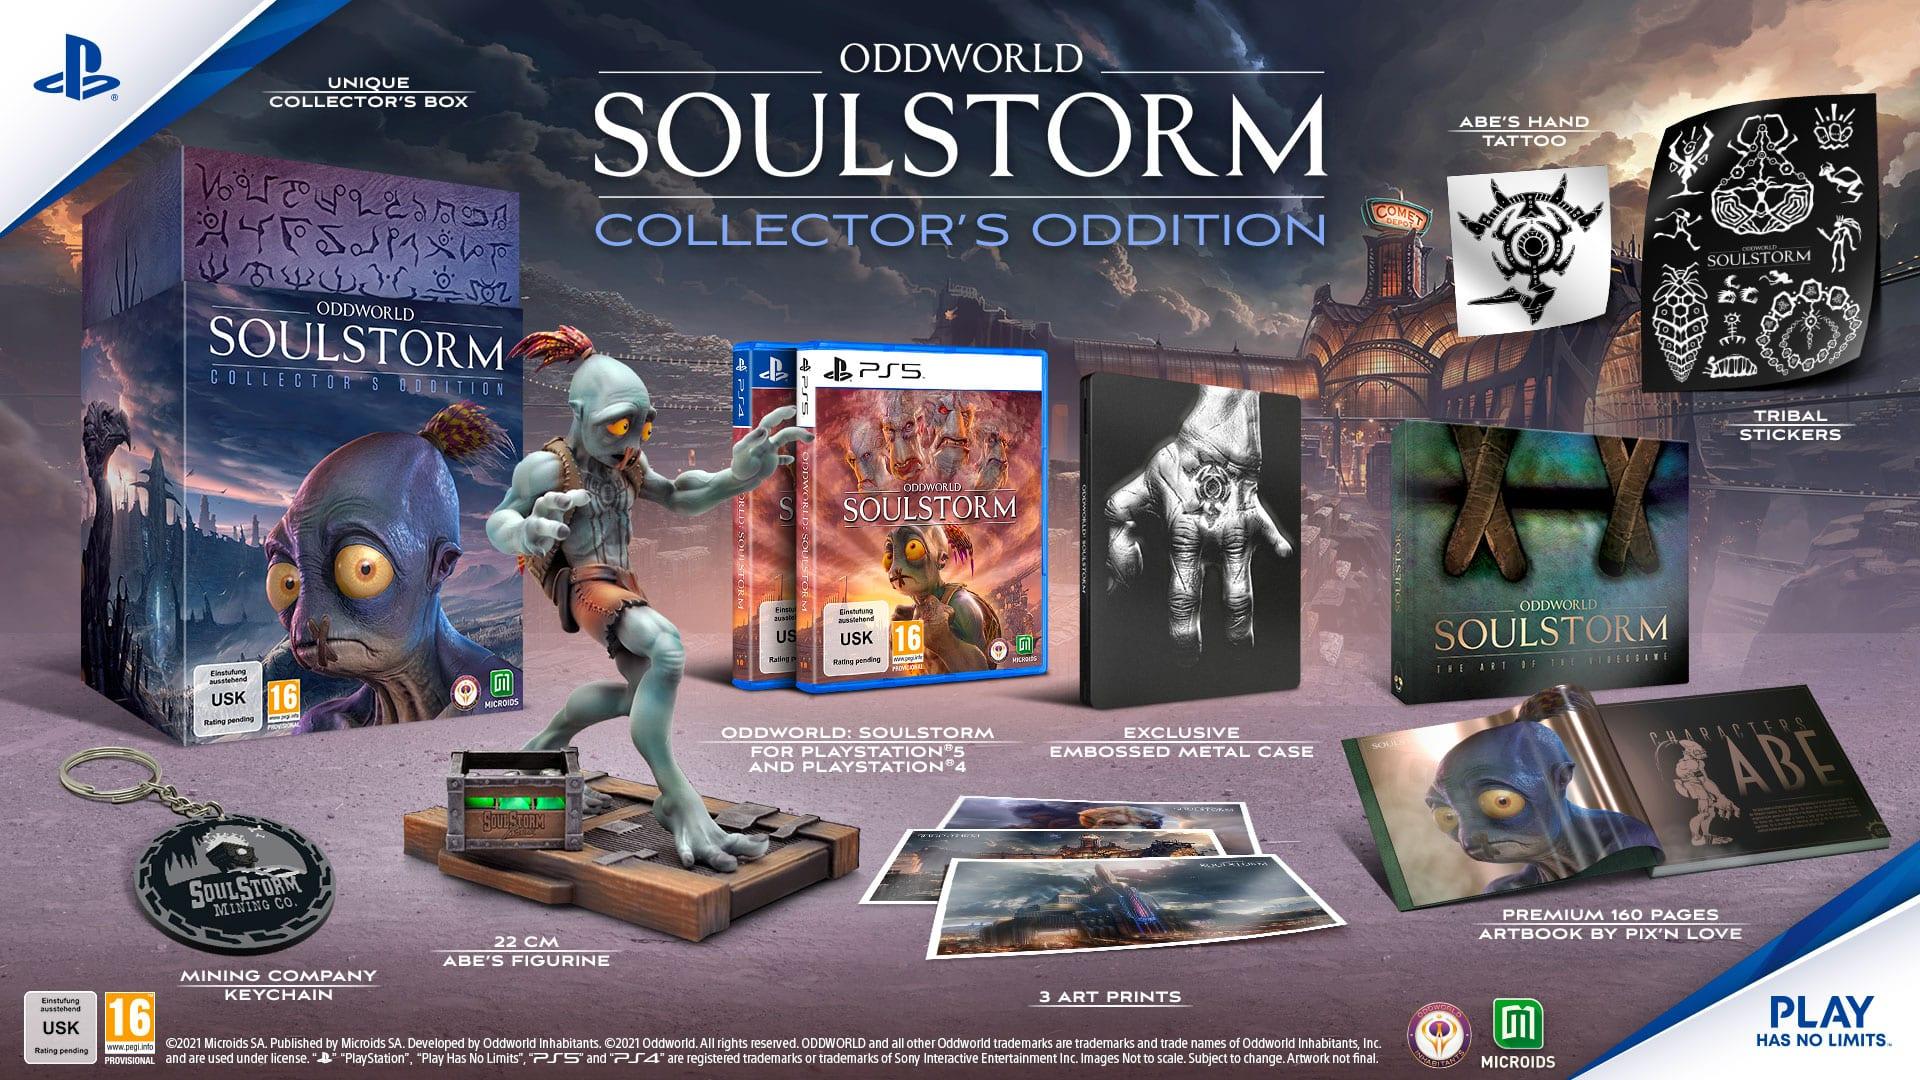 Oddworld Soulstorm - Collector's Edition Oddition